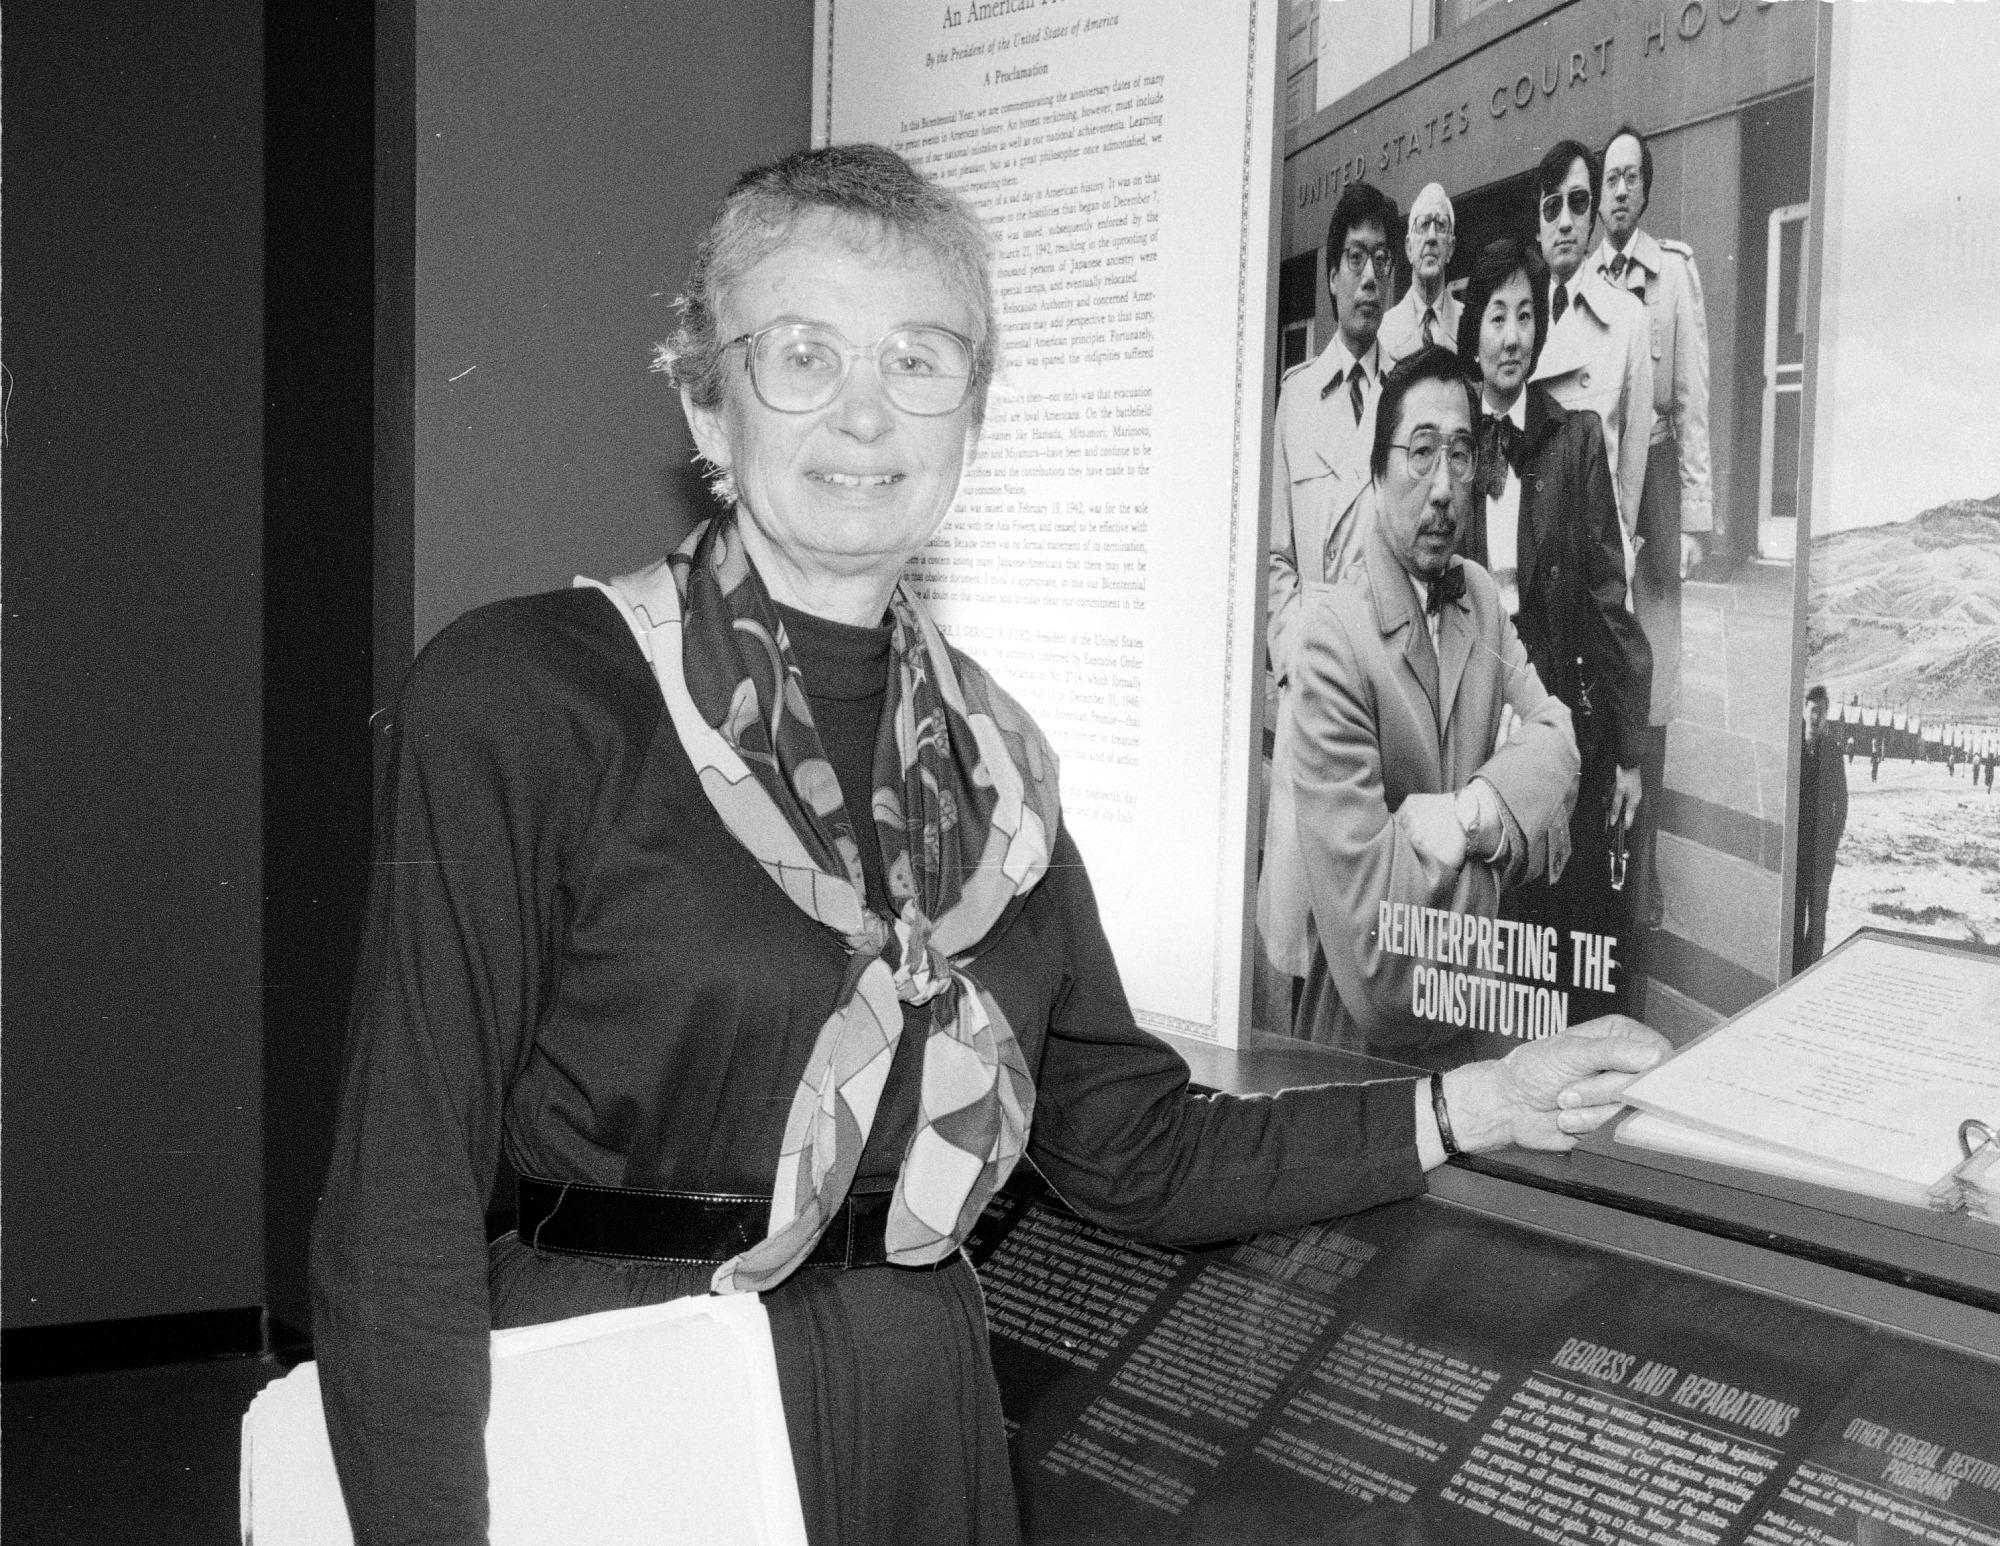 Shirley Cherkasky, by Vargas, Rick, 1991, Smithsonian Archives - History Div, 91-17383-19.